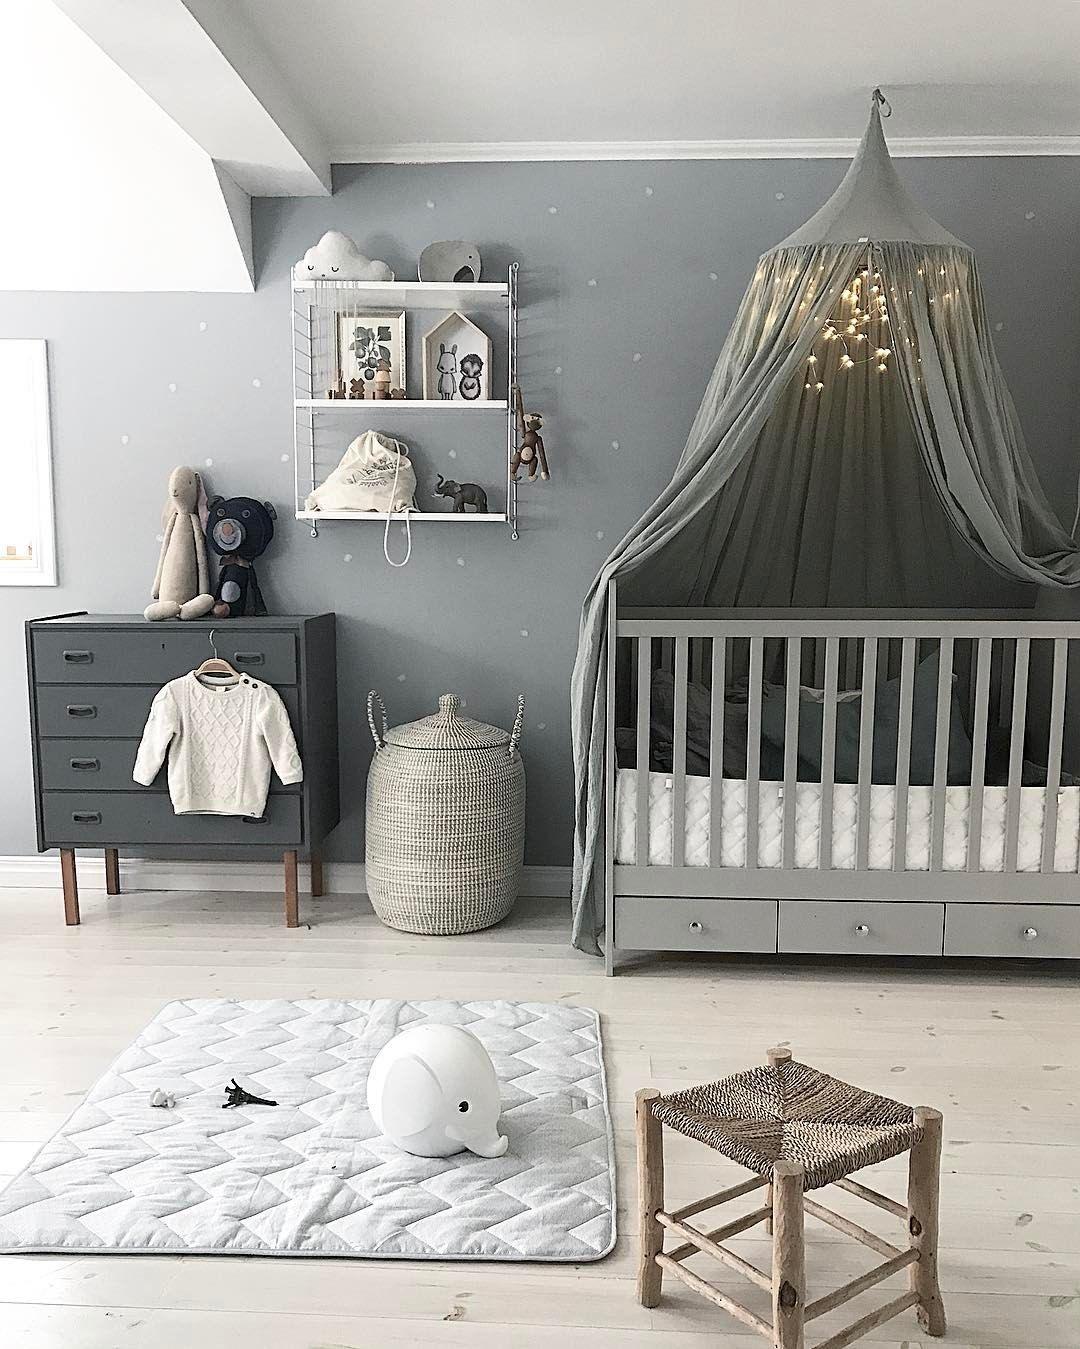 Vintage Bedroom Art Girls Blue Bedroom Ideas Bedroom Decor Stores Unisex Bedroom Paint Ideas: 25+ Interesting Nursery Furniture Room Ideas You'll Love